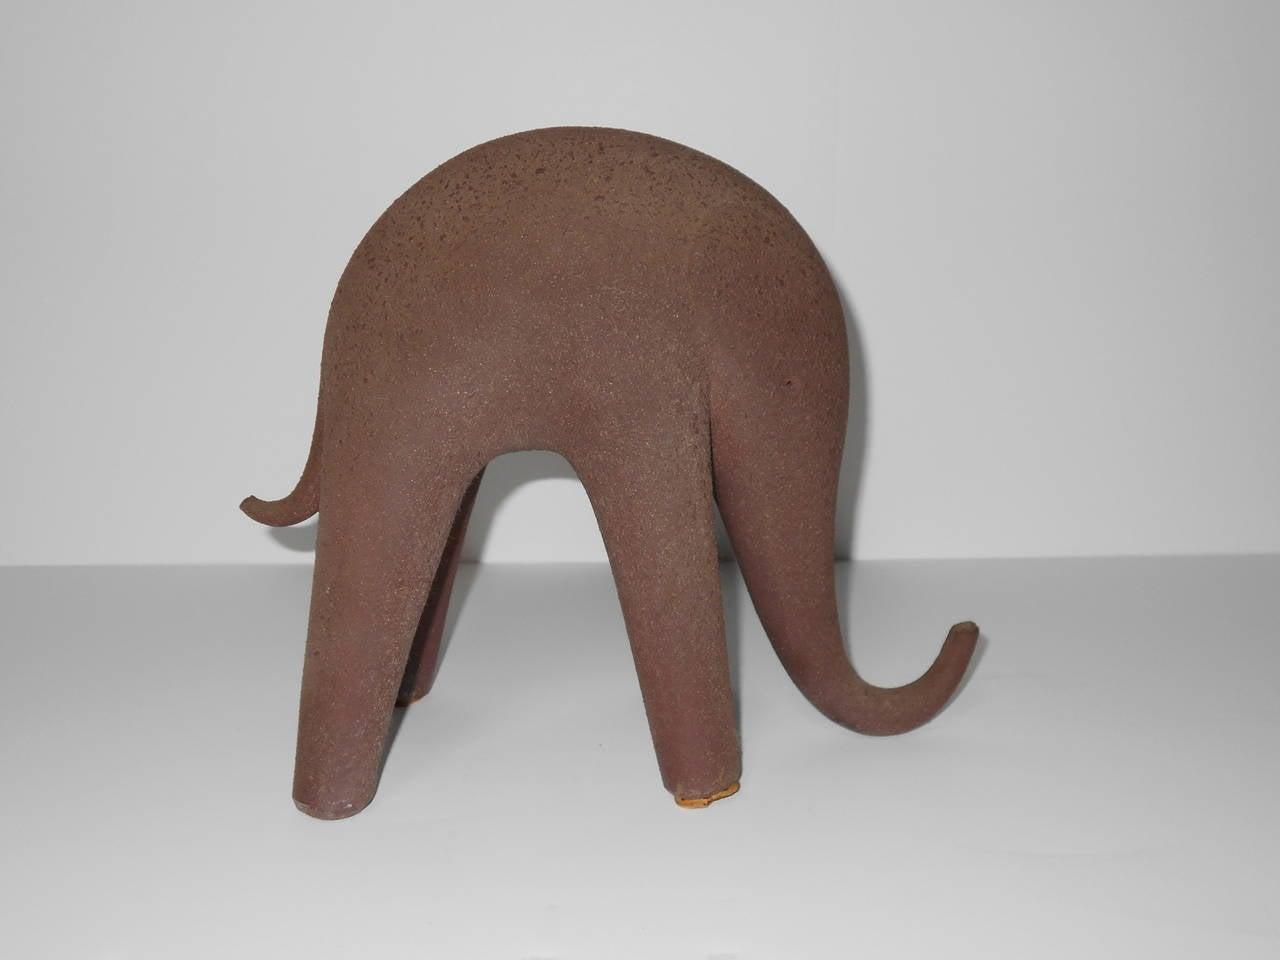 french art deco ceramic elephant sculpture at 1stdibs. Black Bedroom Furniture Sets. Home Design Ideas